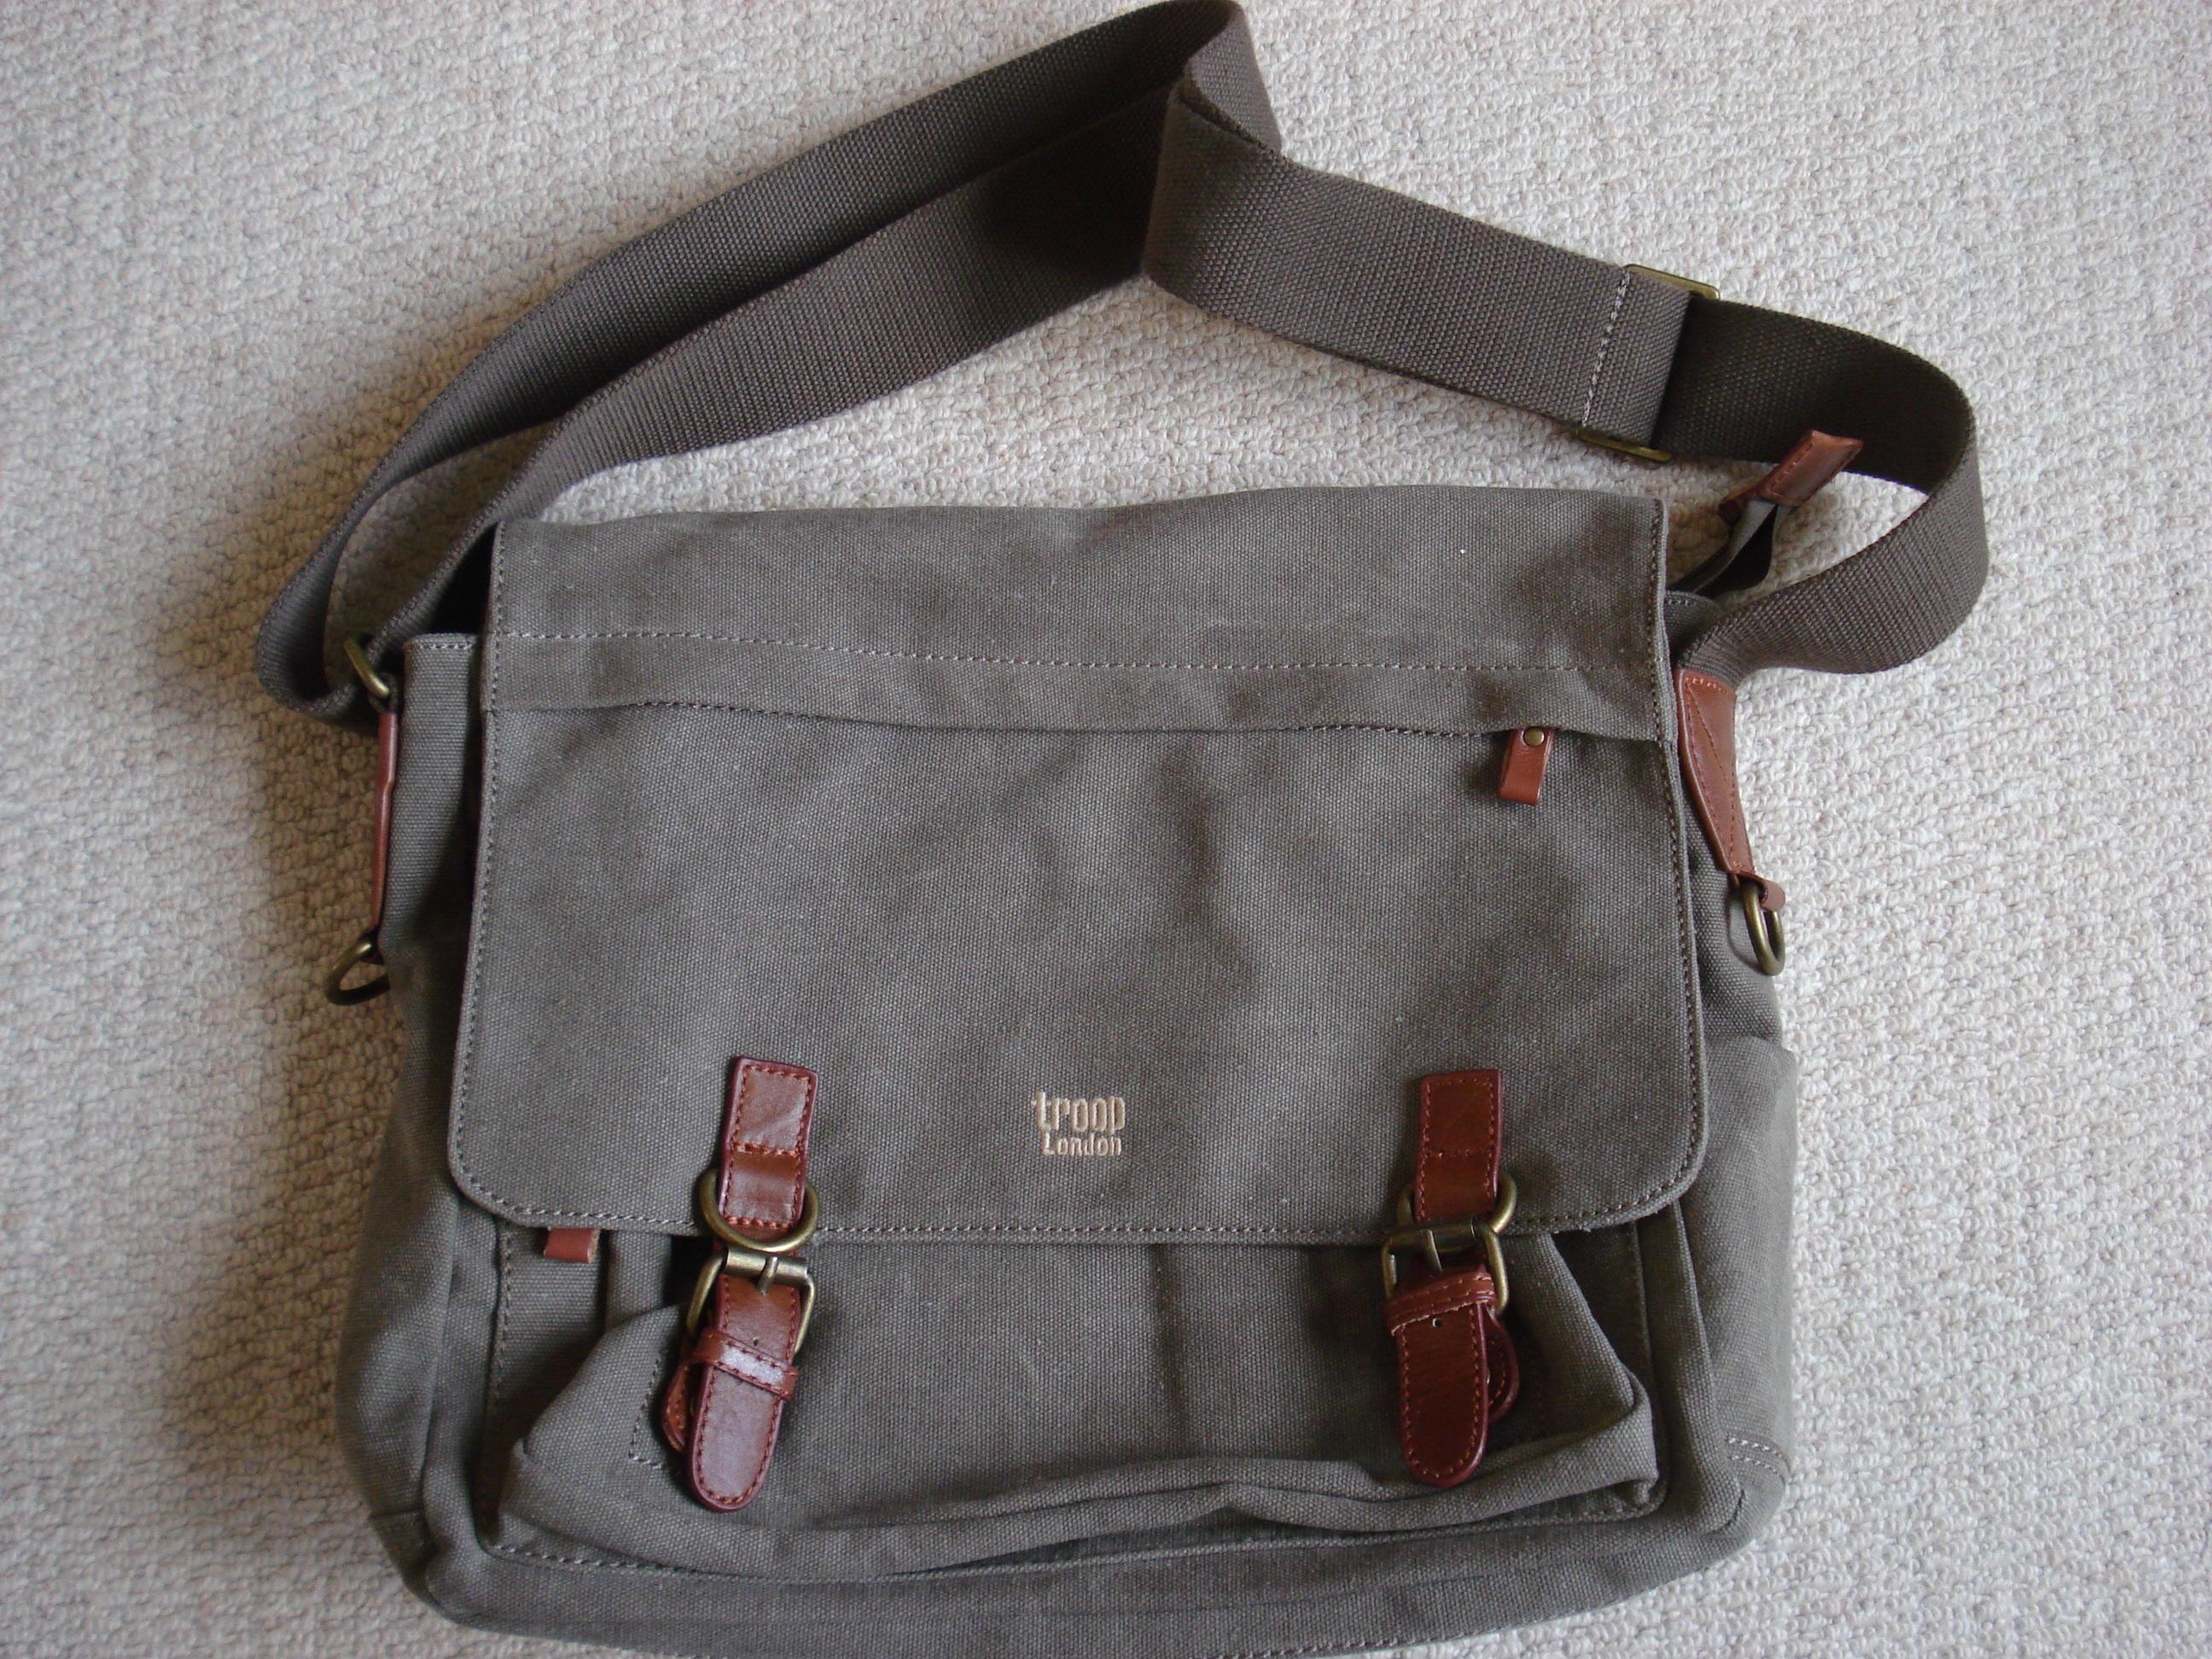 MAN BAG - MESSENGER BAG - TROOP LONDON - BRAND NEW in